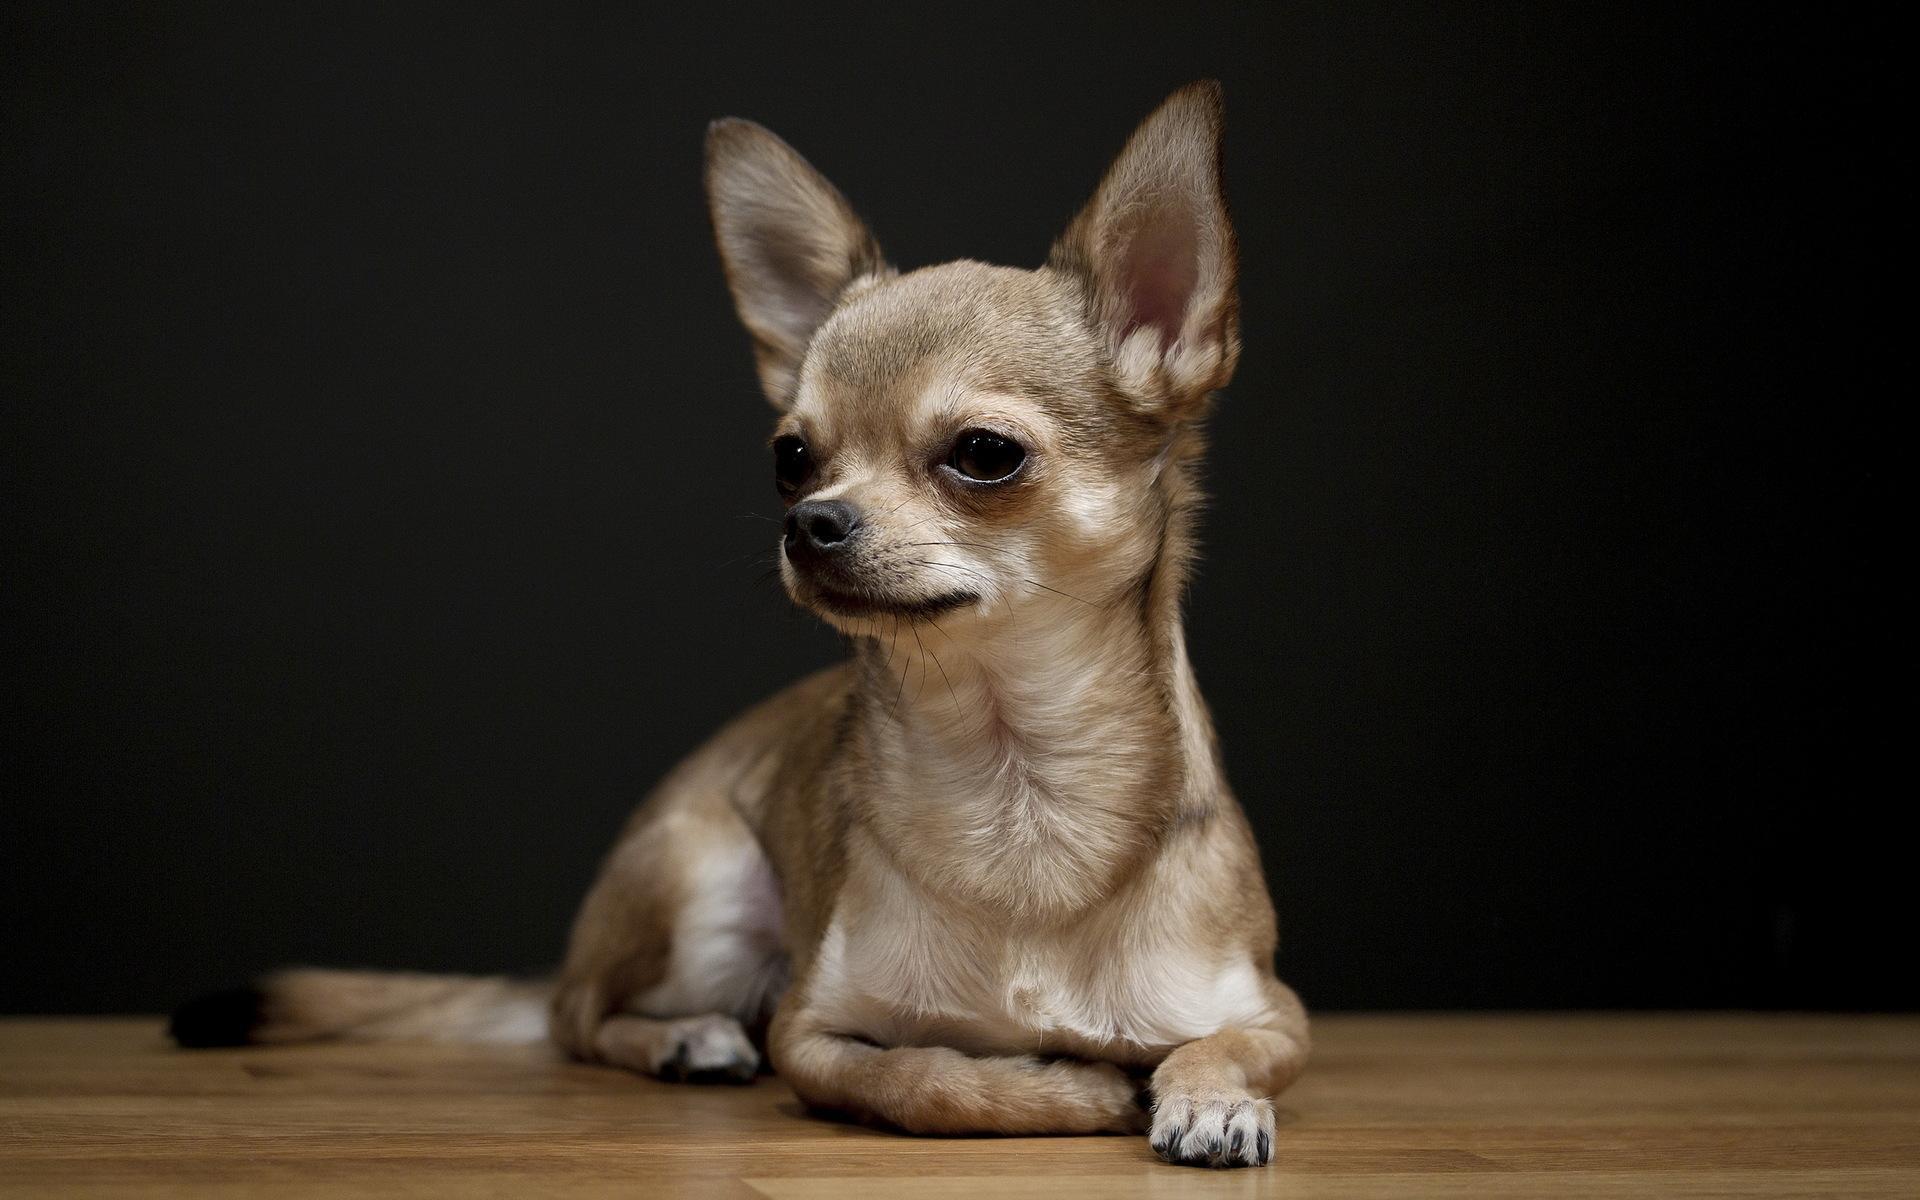 Chihuahua Wallpapers Wallpaper